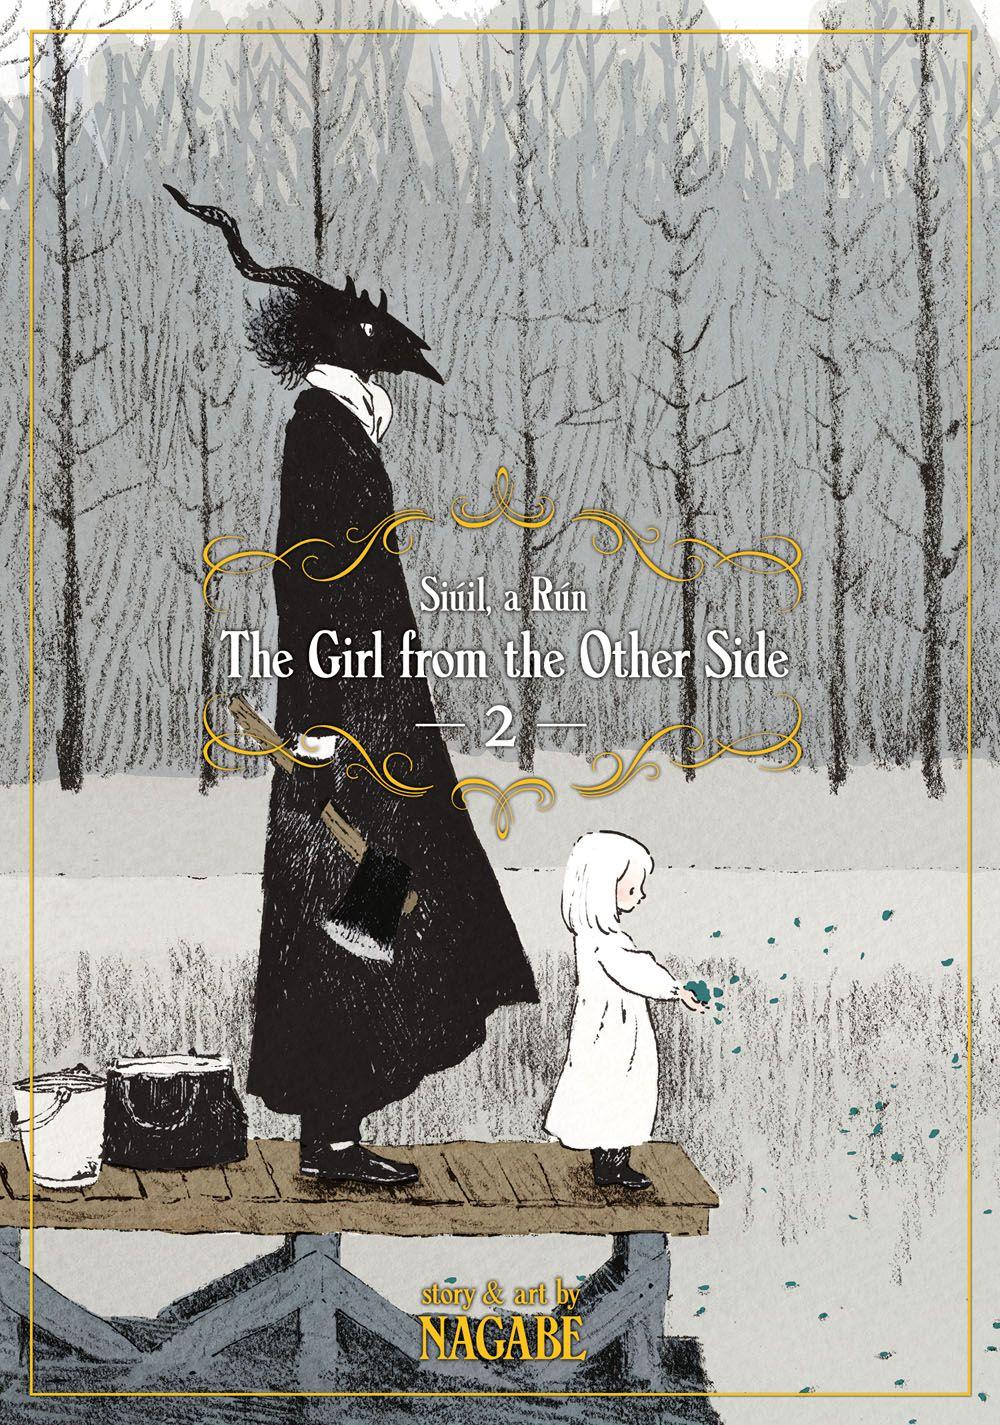 The Girl From The Other Side Siuil A Run Manga Volume 2 Art Art Inspiration Illustration Art